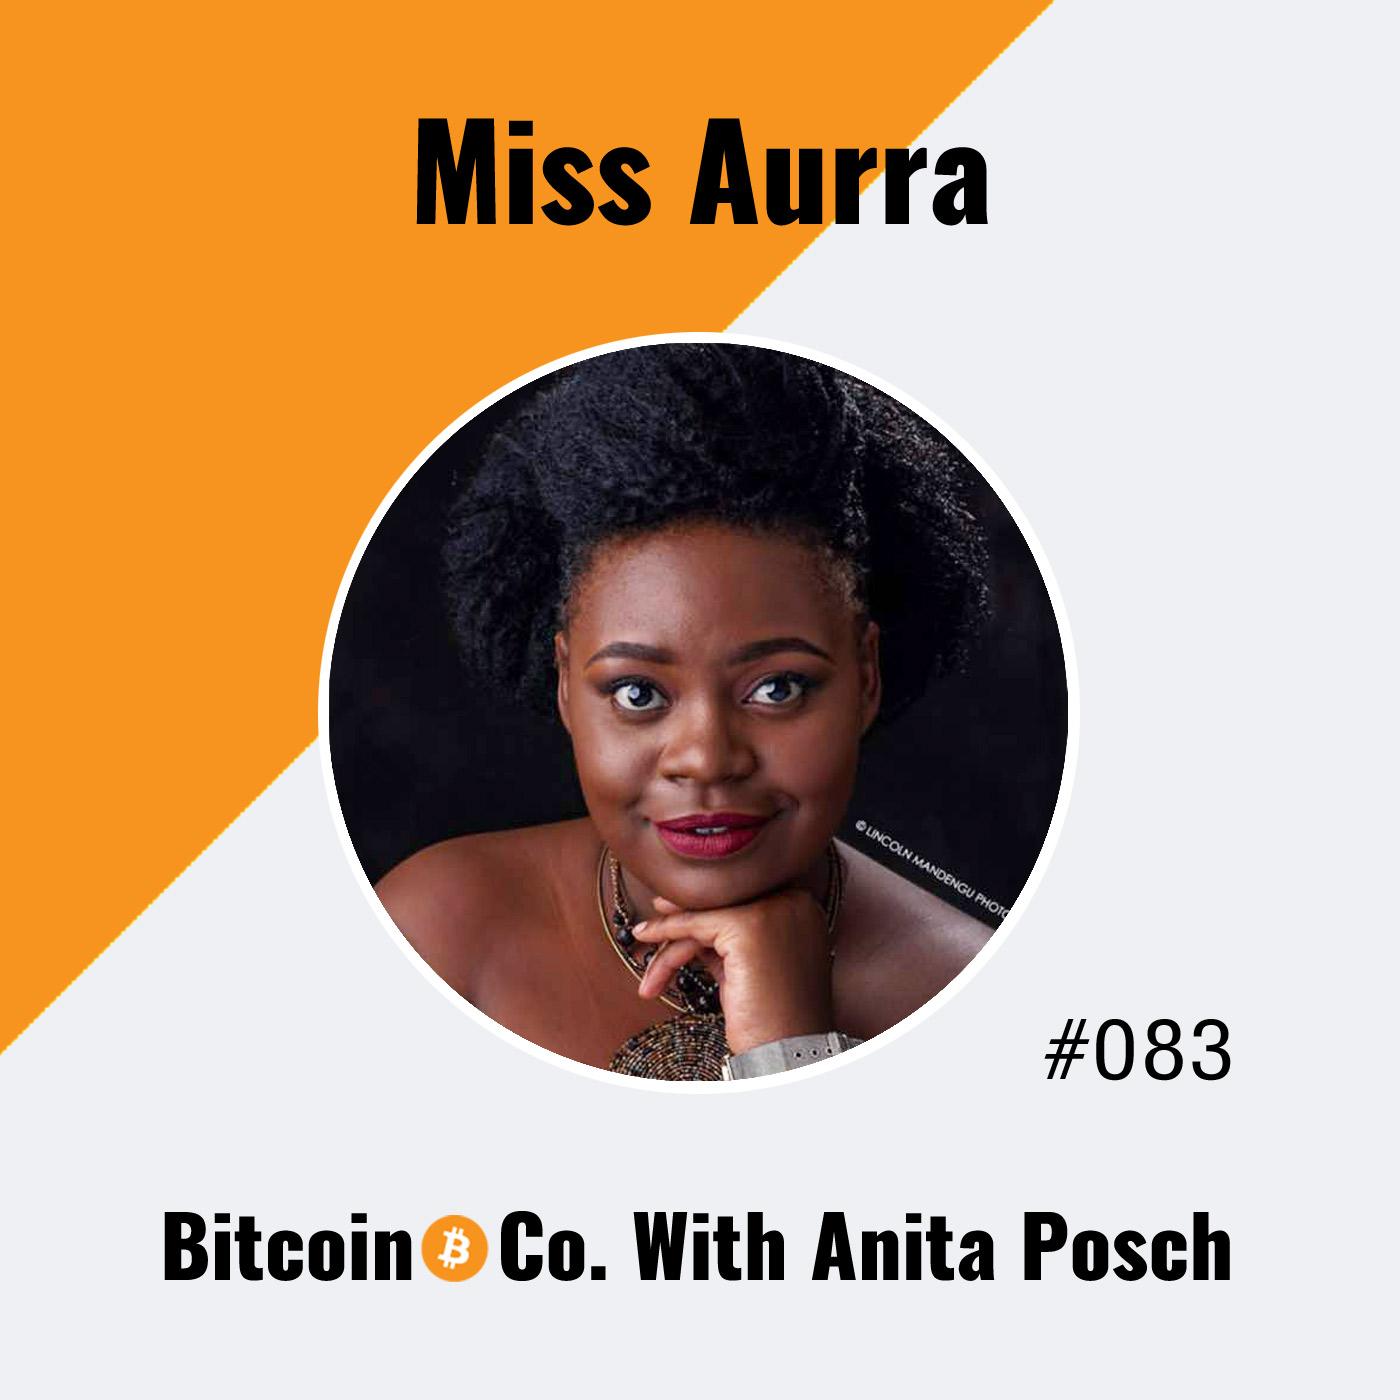 Miss Aurra, Zimbabwe: Bitcoin Changed My Whole Life